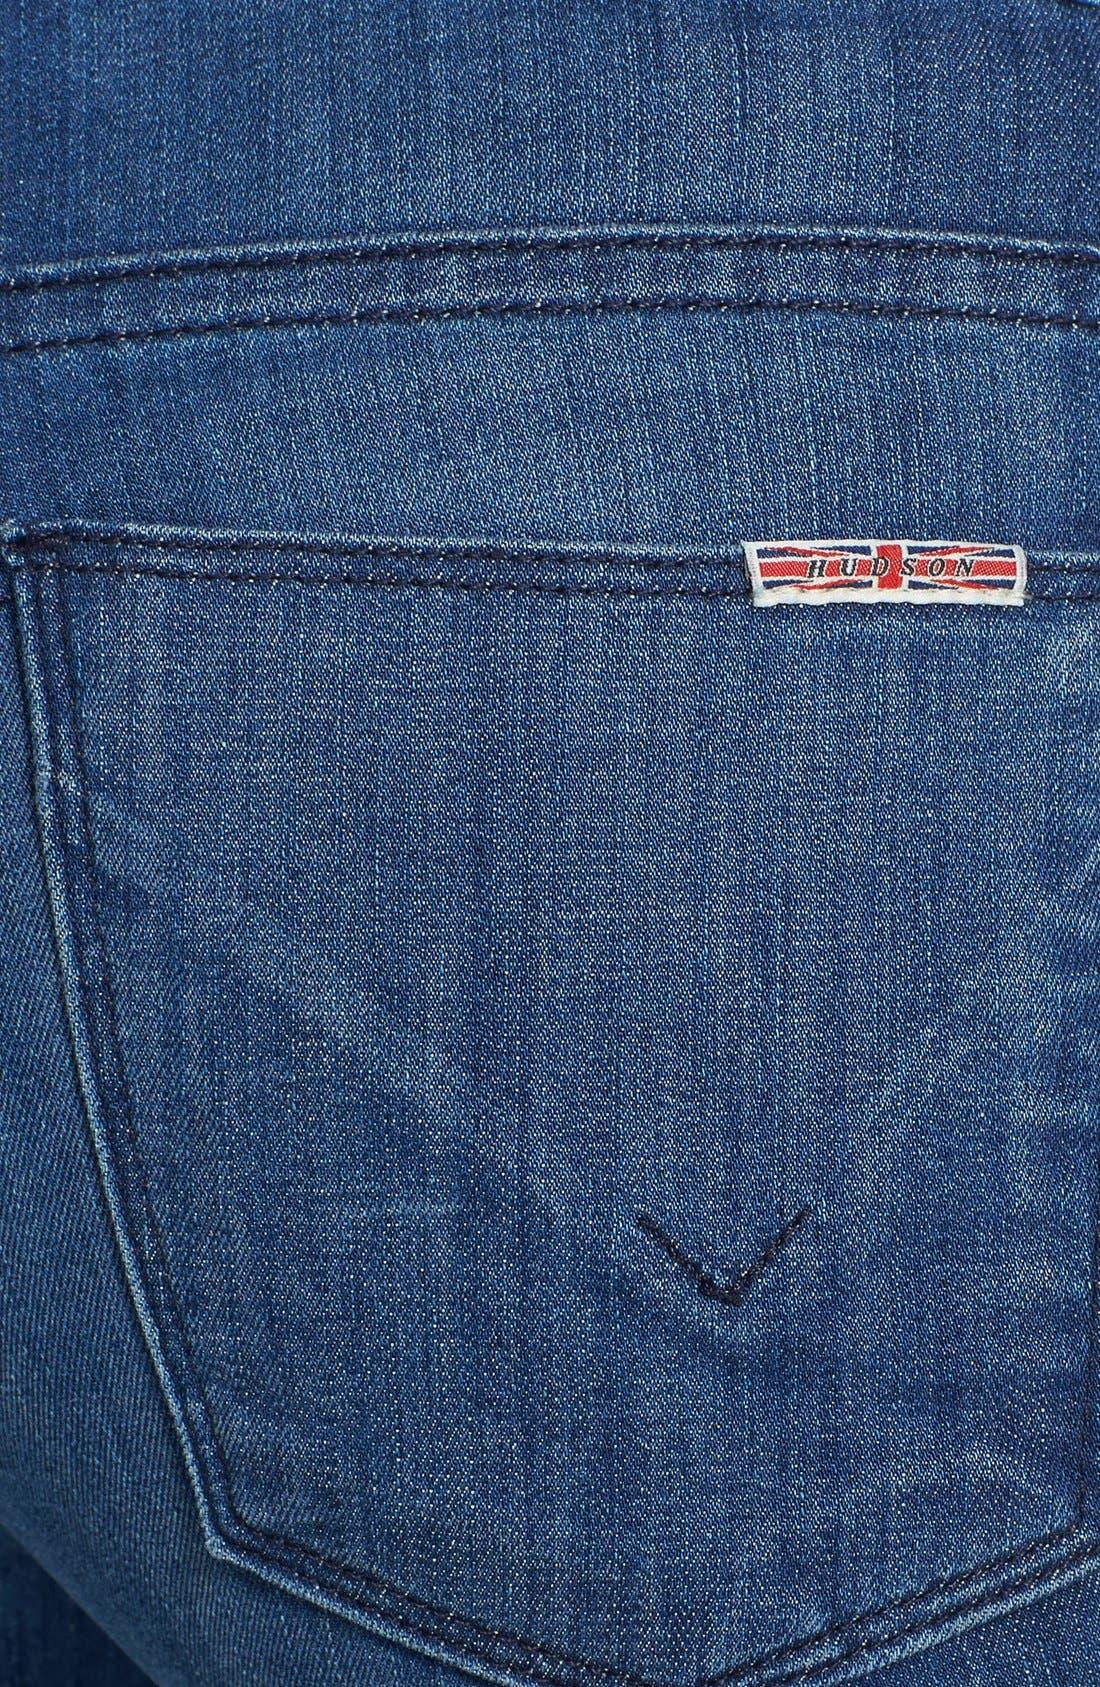 Alternate Image 3  - Hudson Jeans 'Elle' Baby Bootcut Jeans